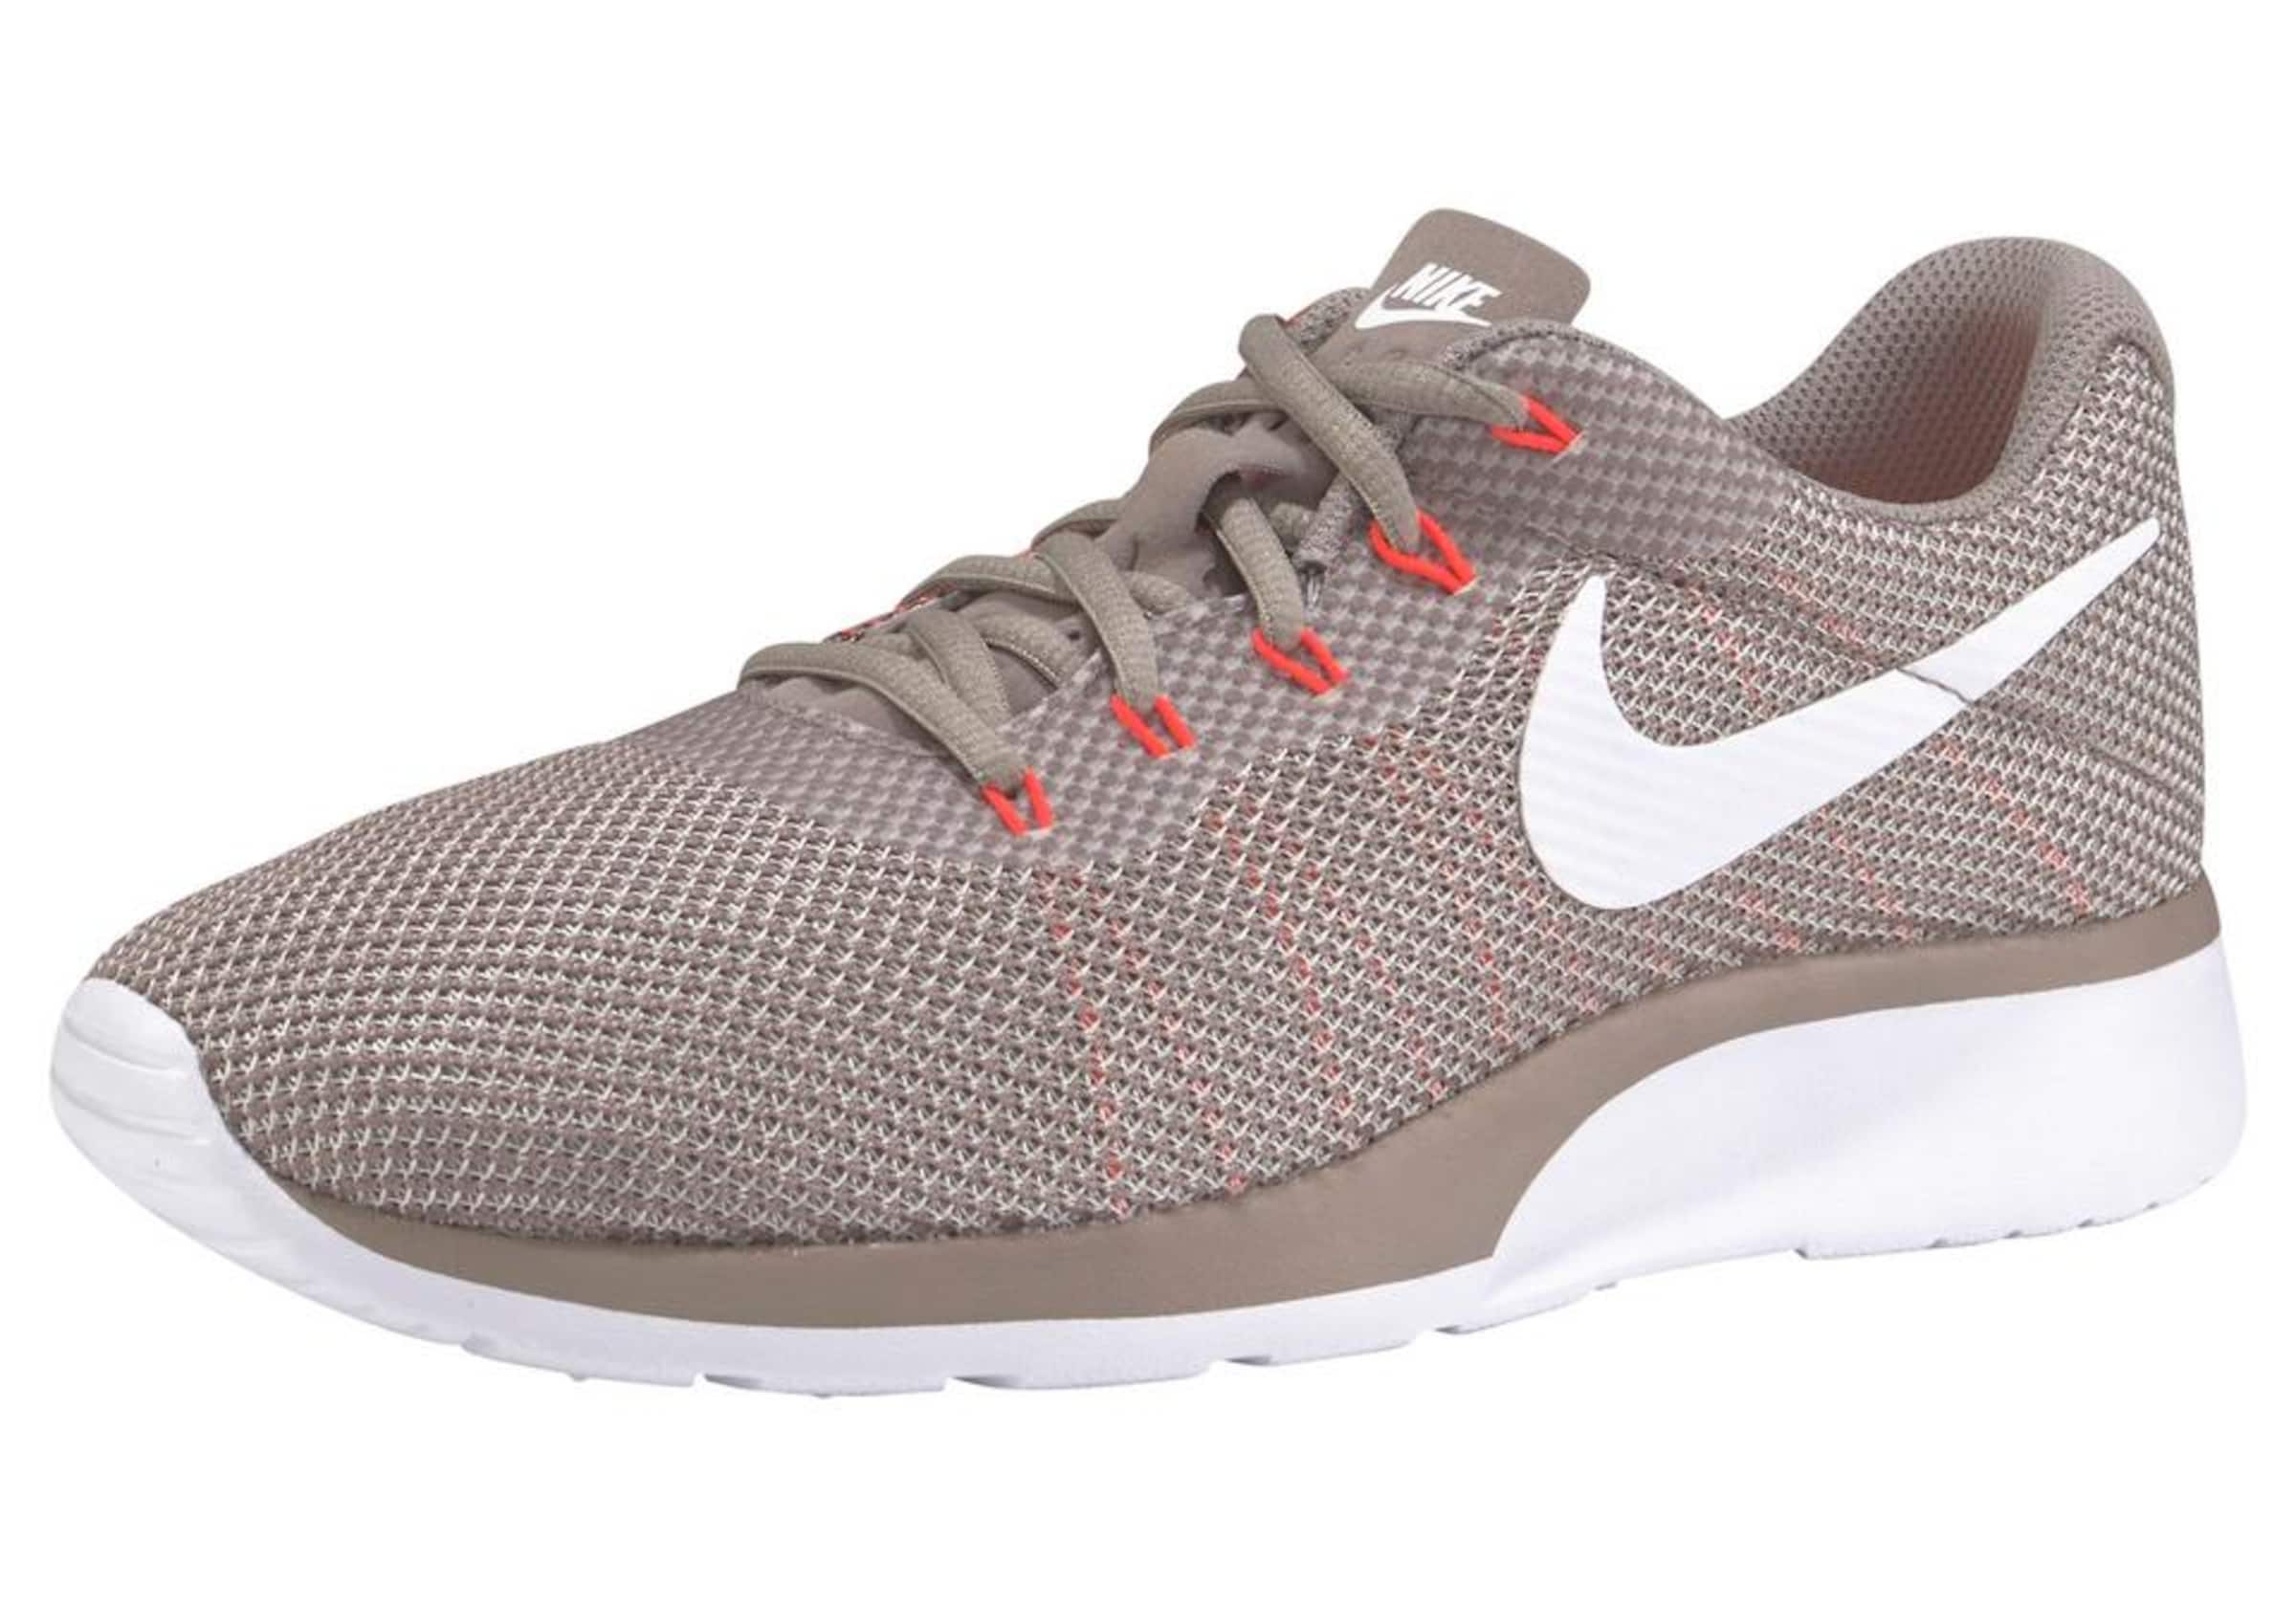 Nike Sportswear | Turnschuhe»Tanjun Turnschuhe»Tanjun Turnschuhe»Tanjun Racer« db7ca9